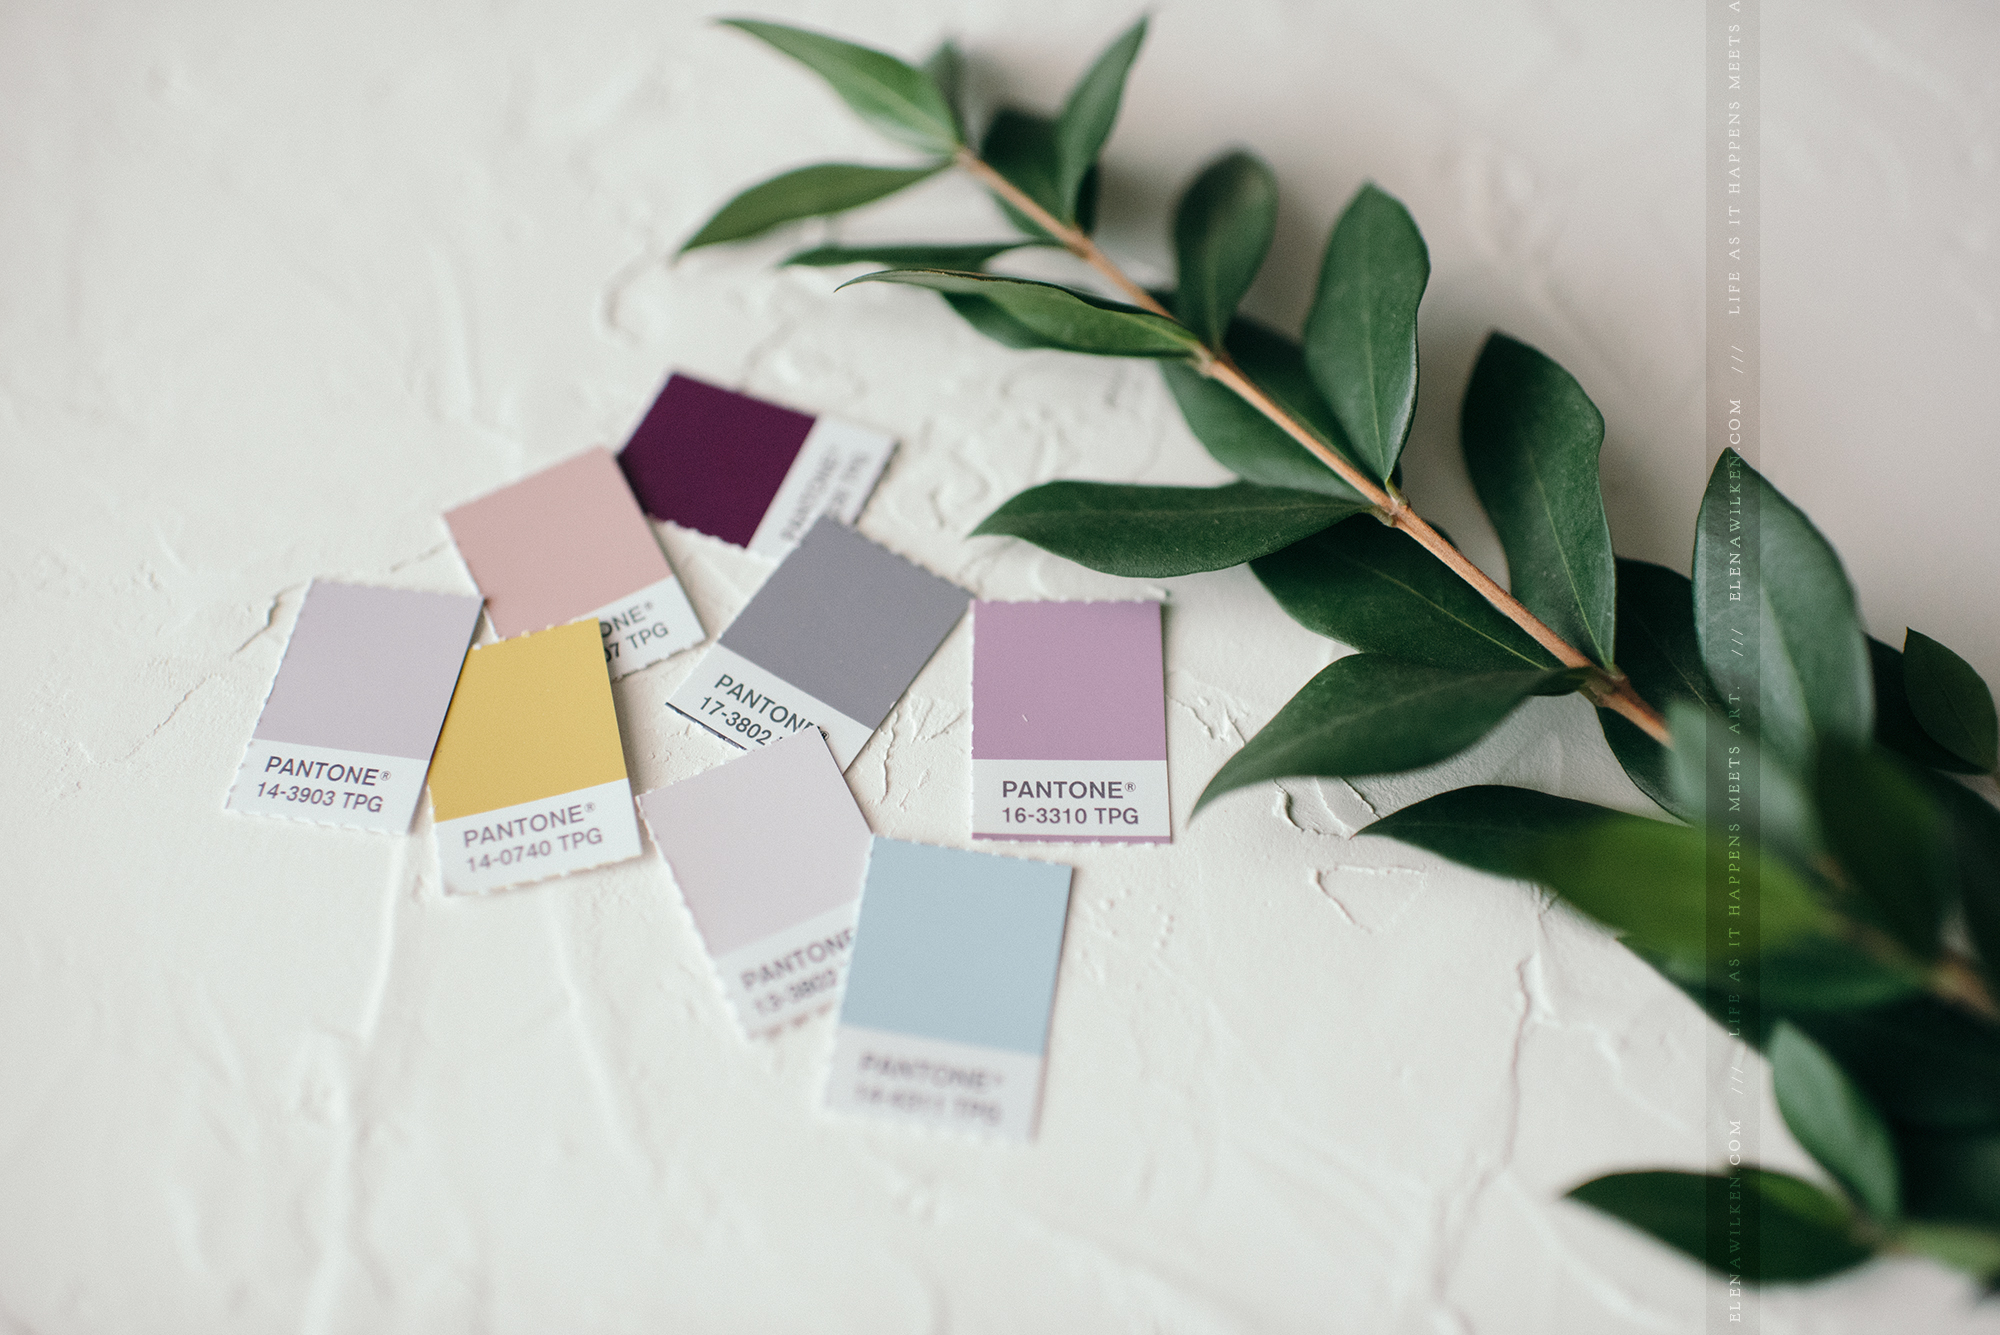 branding-ew-couture-pantone-color-palette.jpg